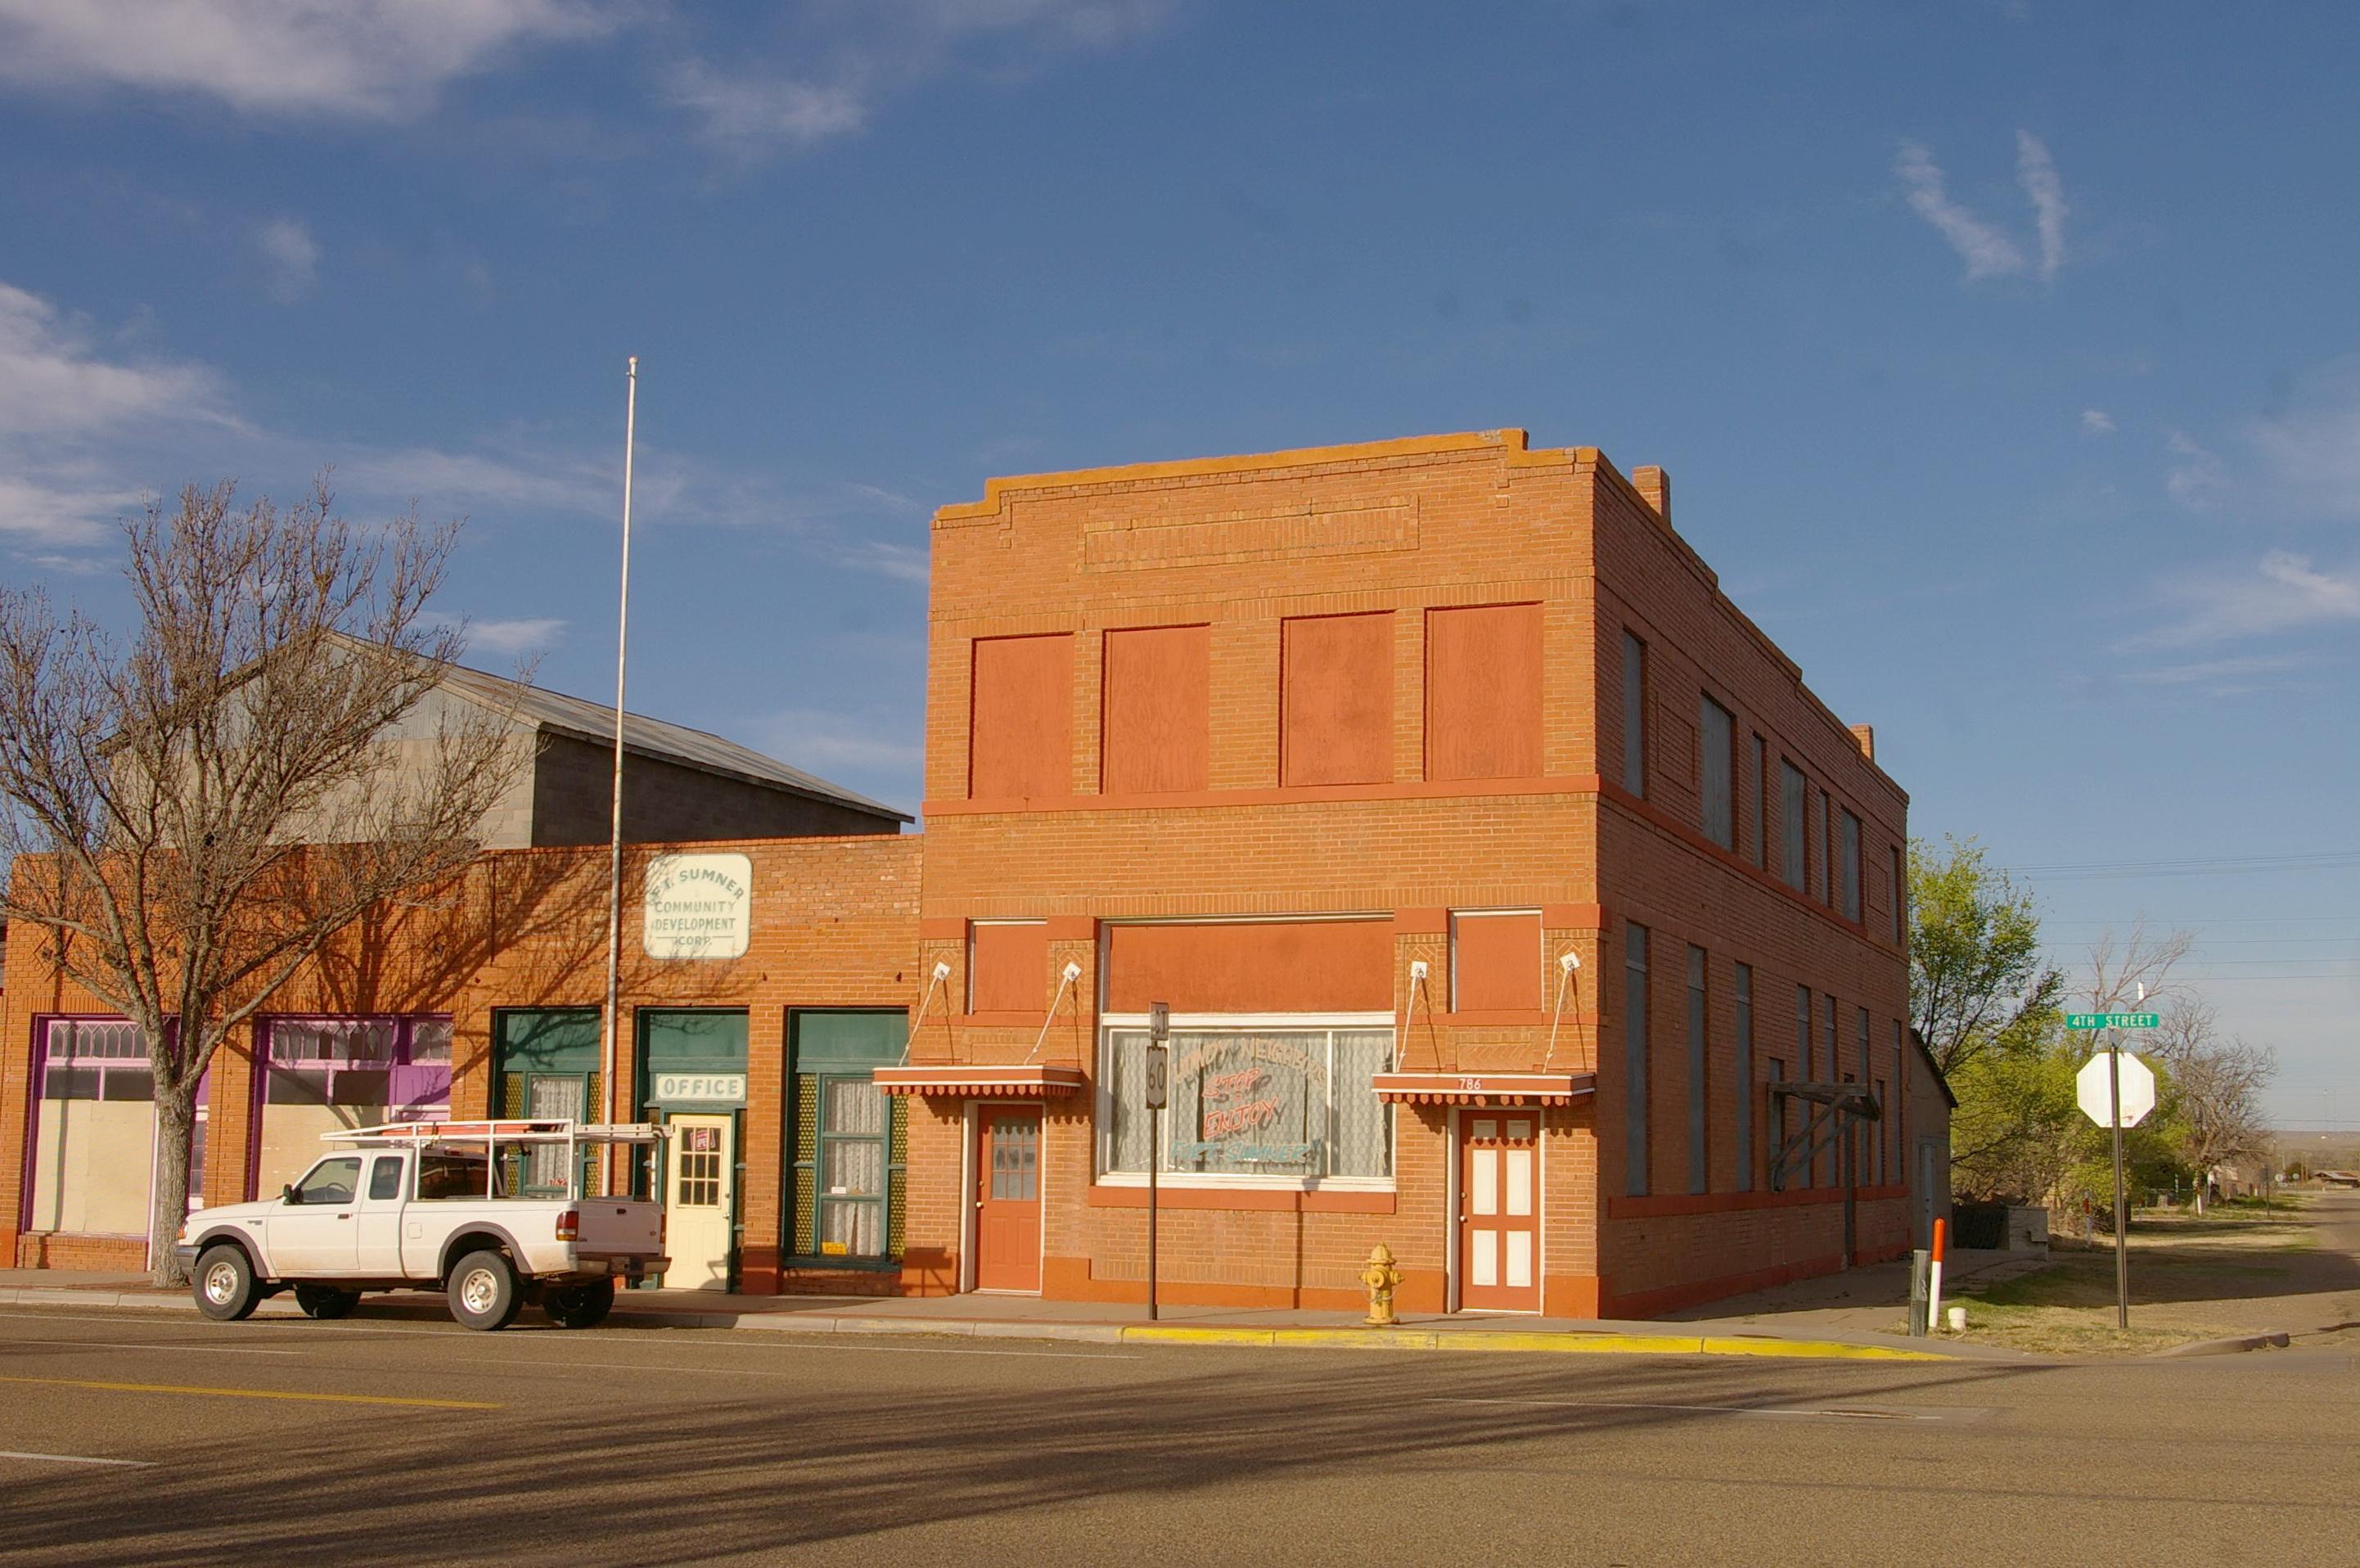 De Baca County Us Courthouses